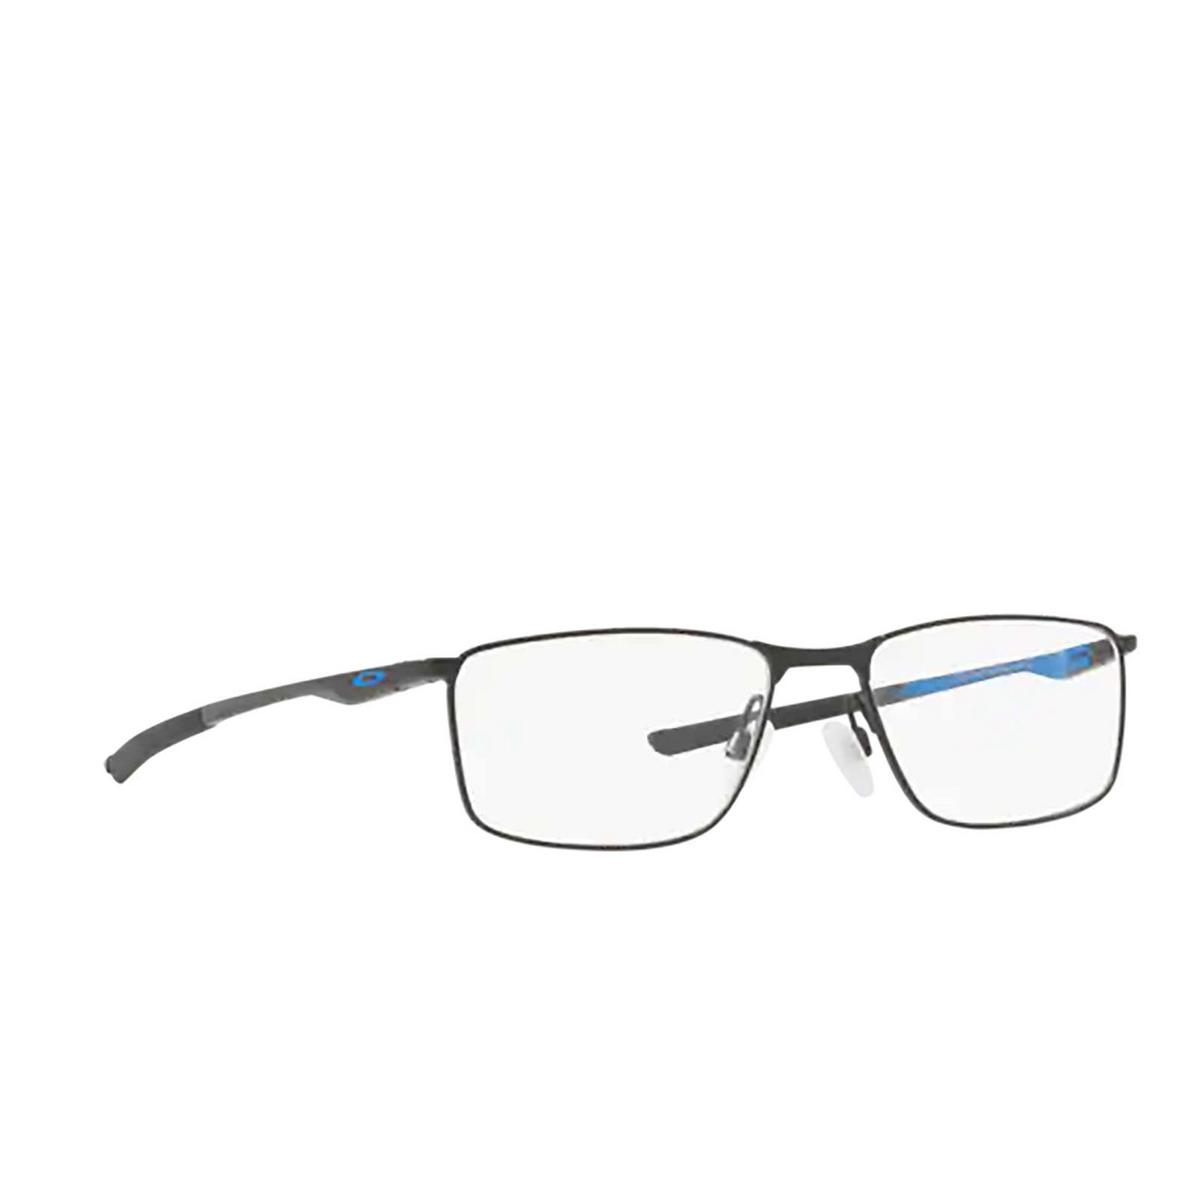 Oakley® Rectangle Eyeglasses: Socket 5.0 OX3217 color Satin Black 321704.